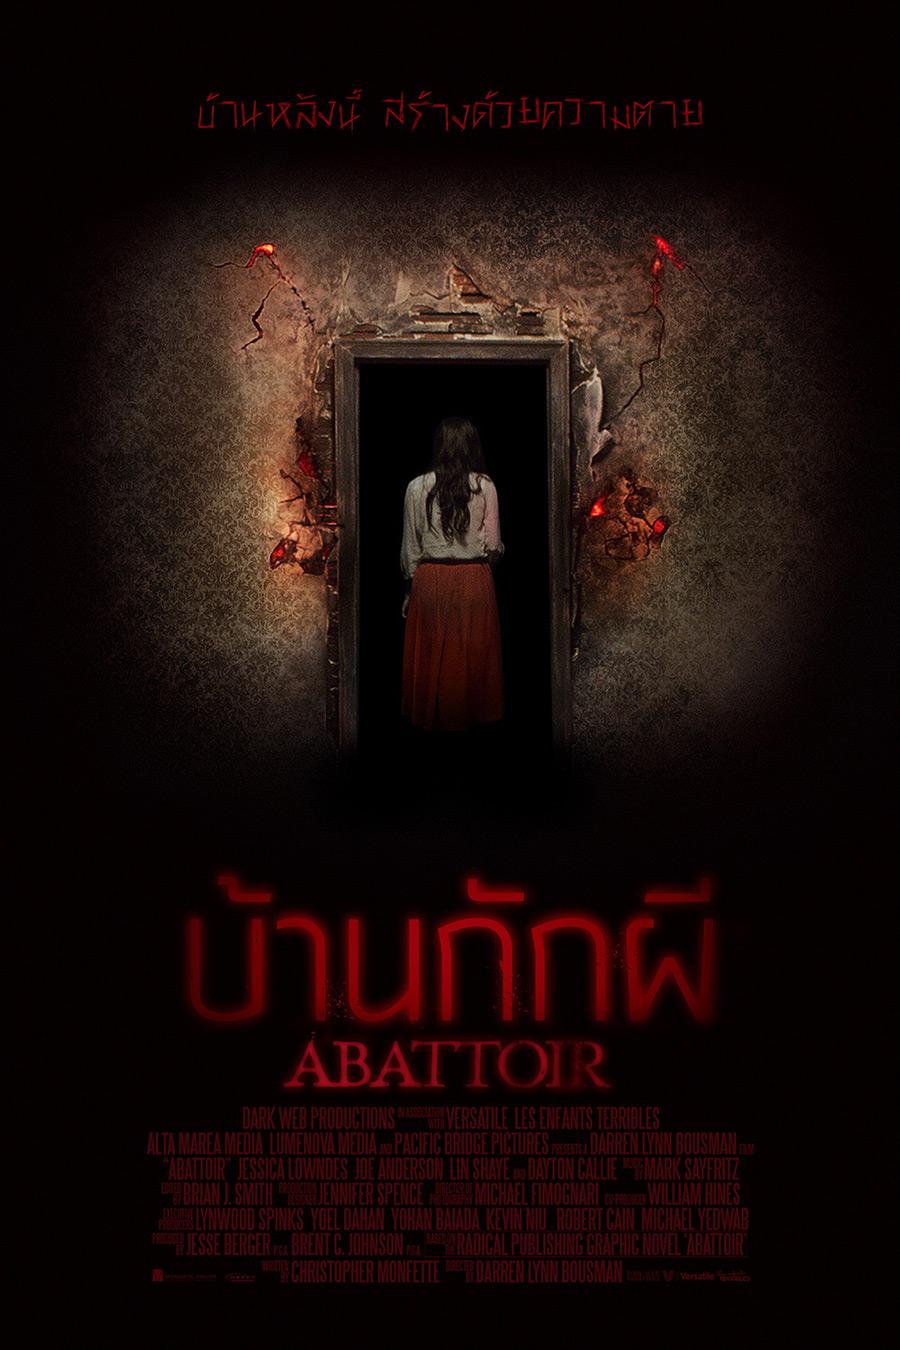 ABATTOIR_poster